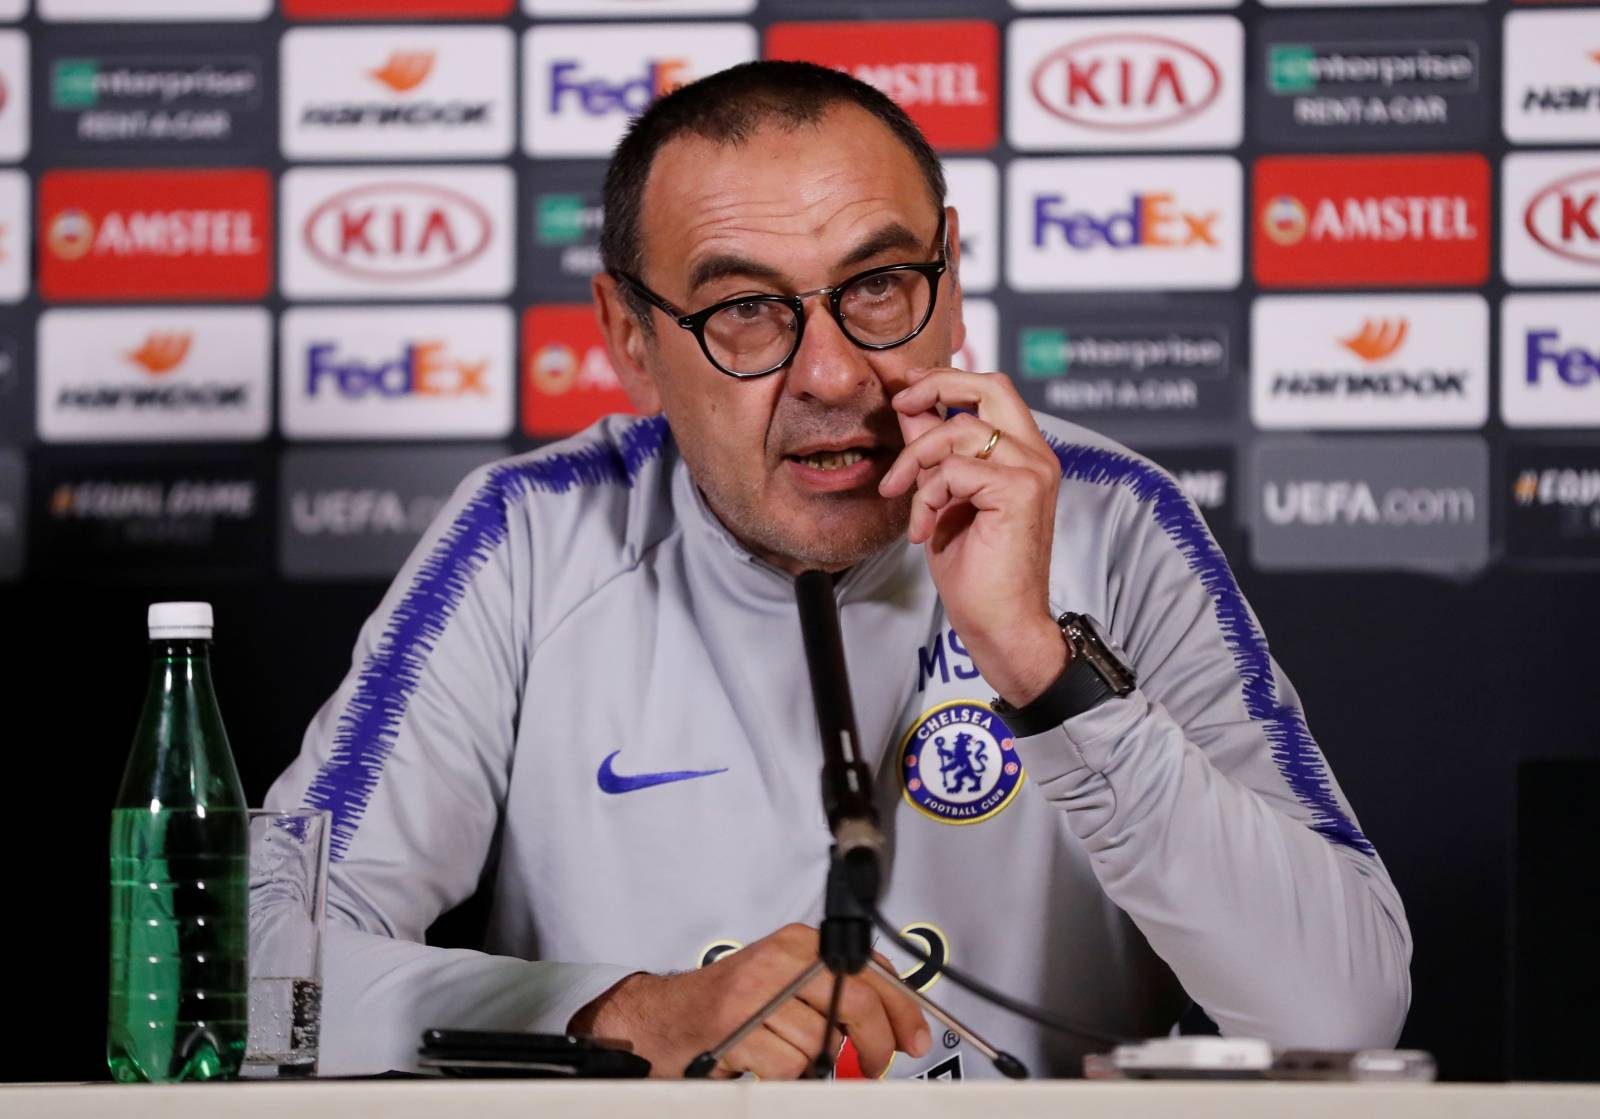 Europa League - Chelsea Media Day